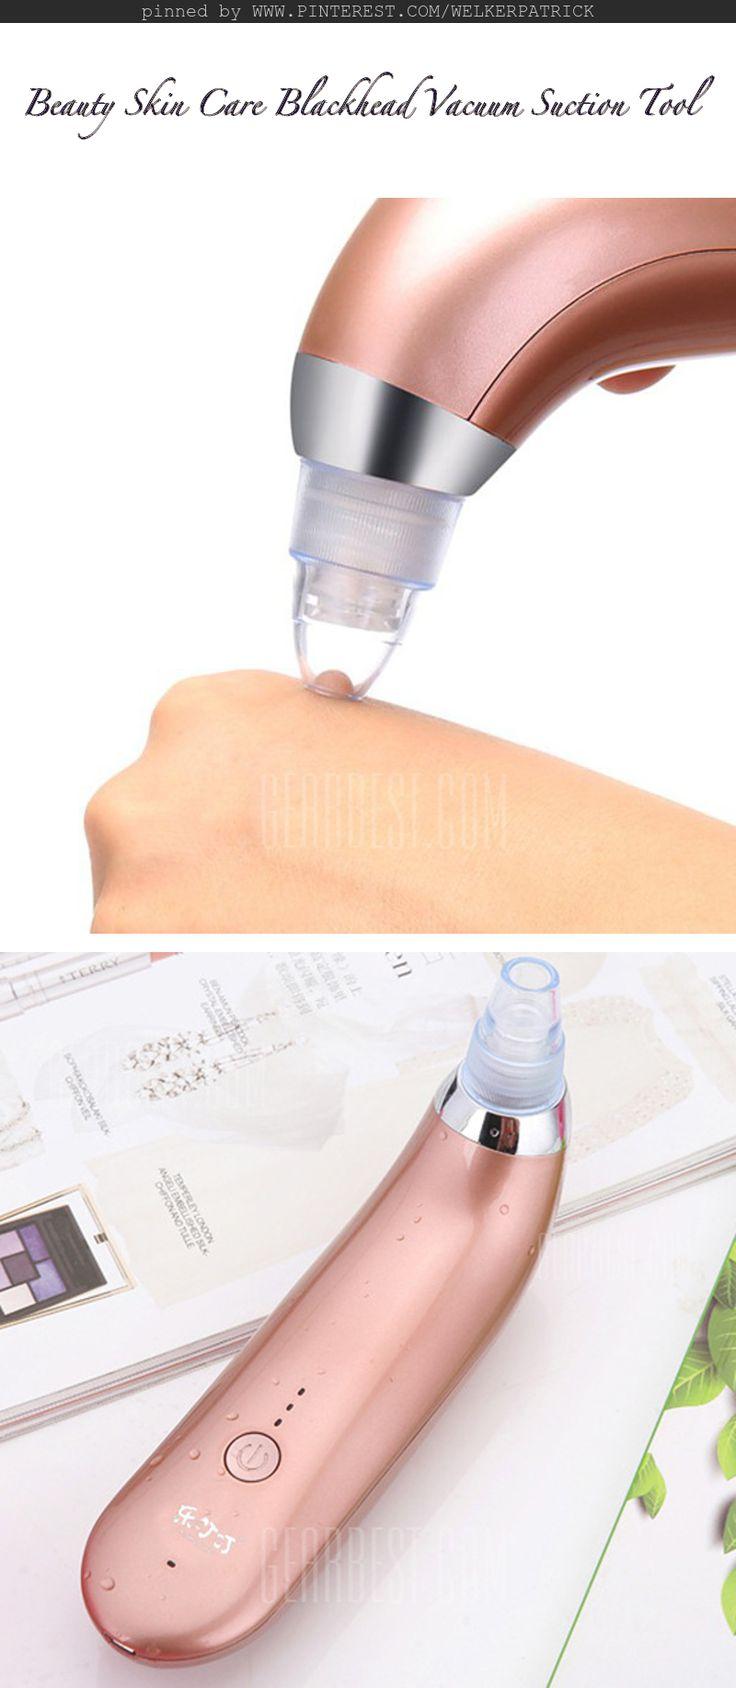 Beauty Skin Care Blackhead Vacuum Suction Tool